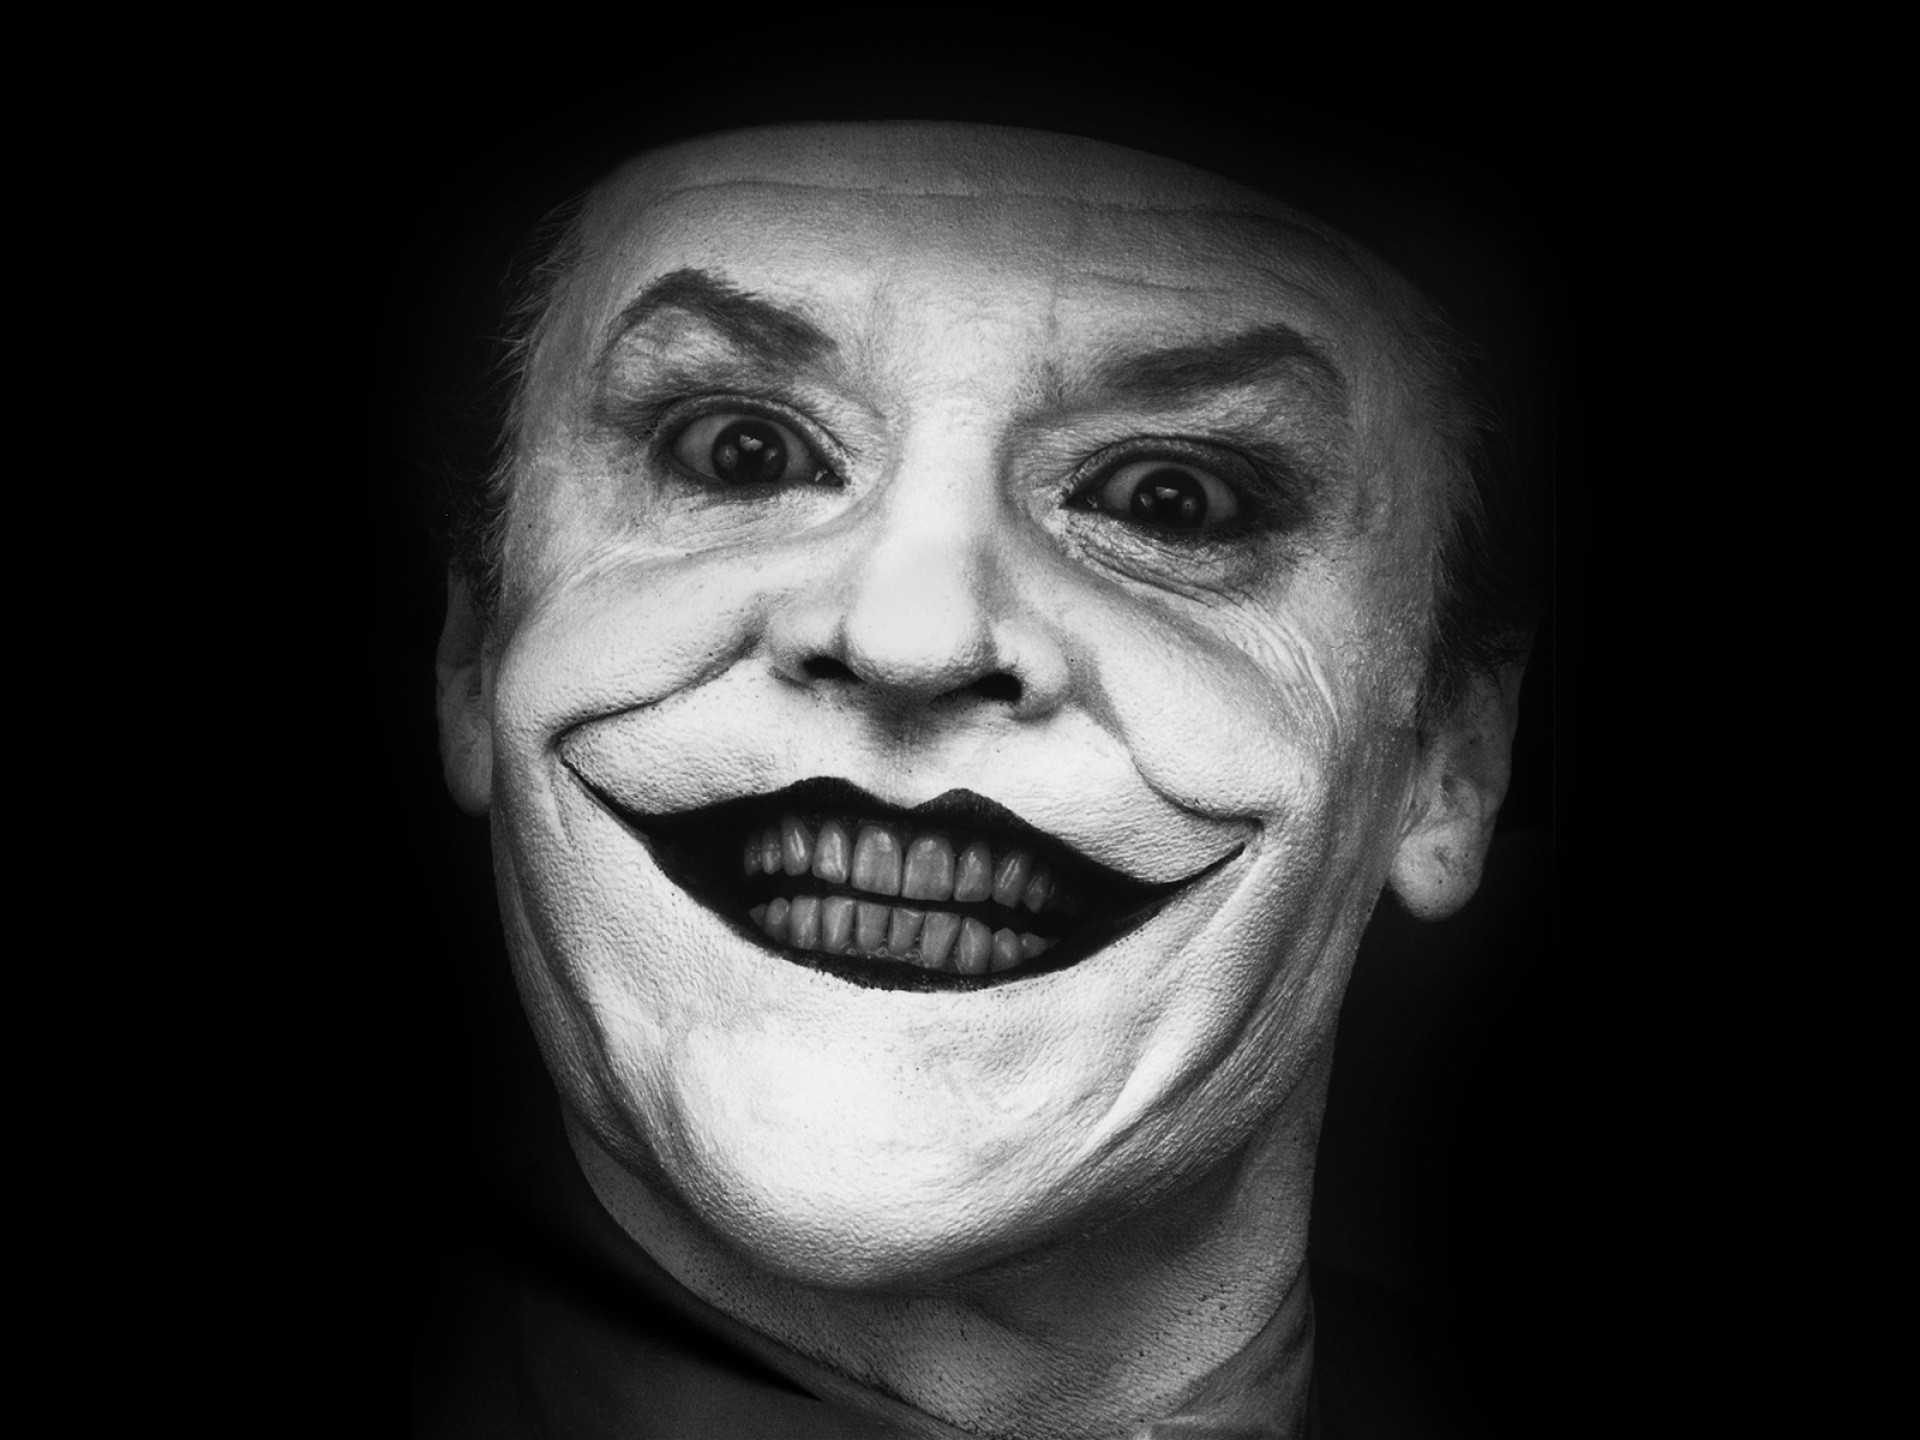 Joker Comicfigur  Wikipedia